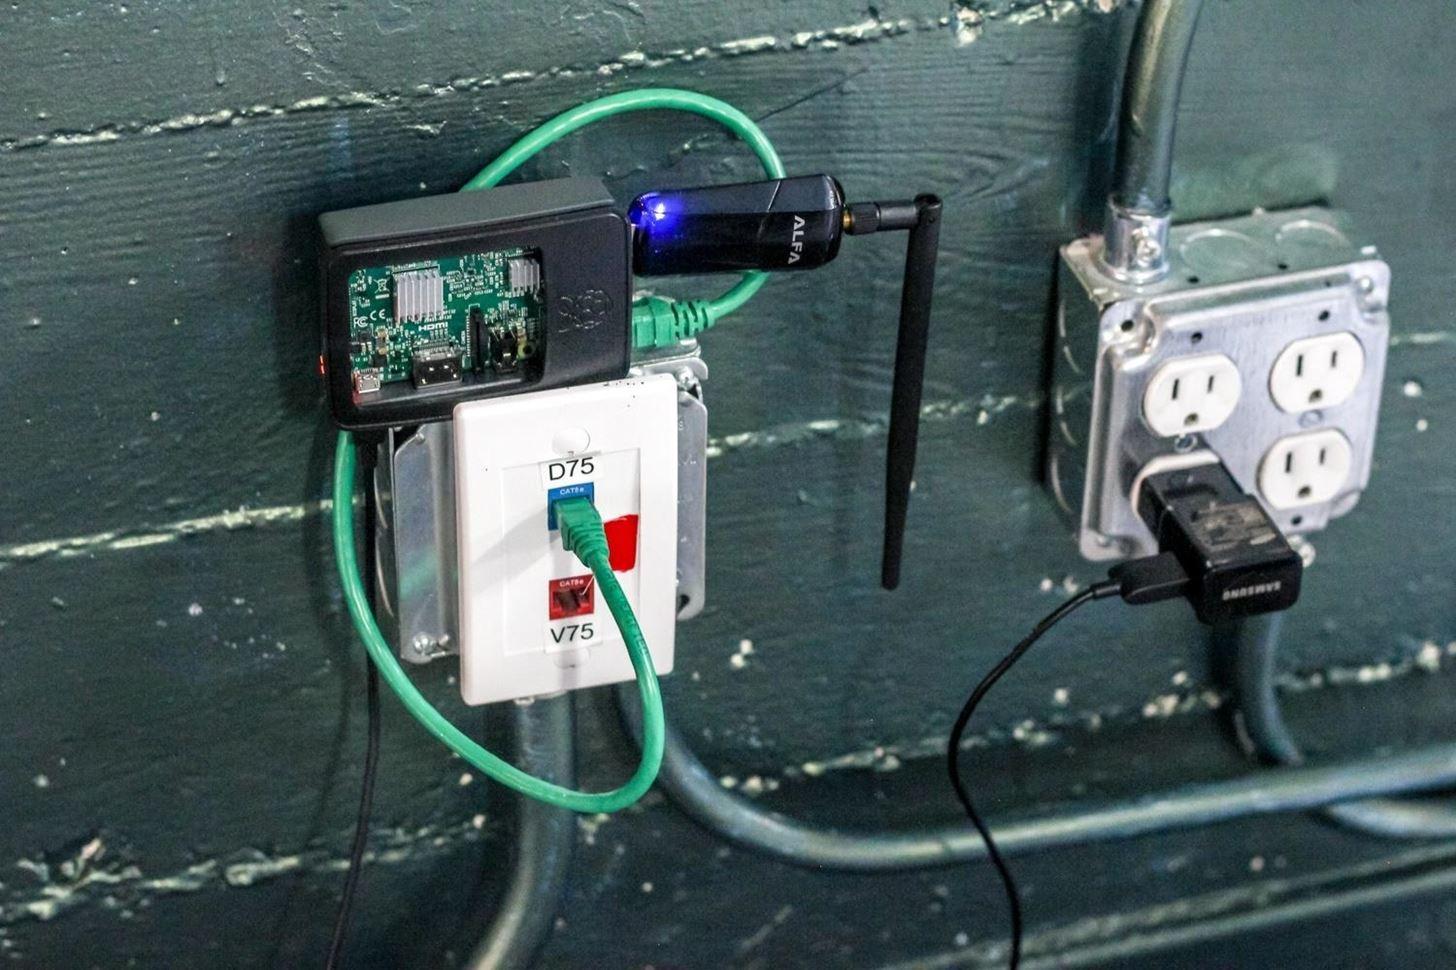 rogue wifi device raspberry pi syntricks